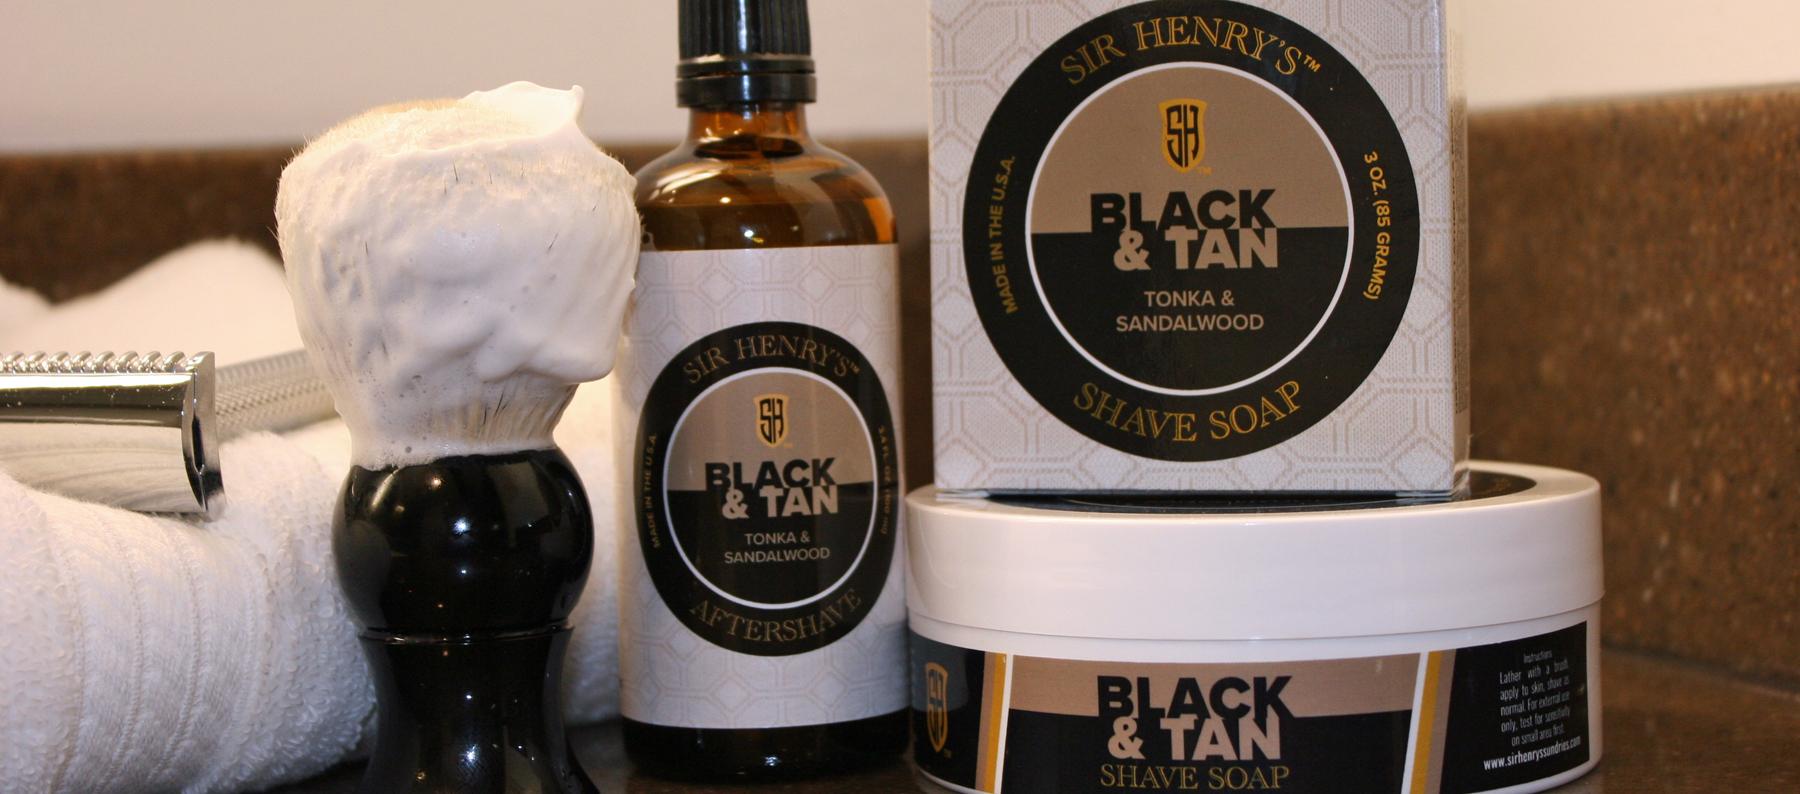 Sir Henry's Black & Tan